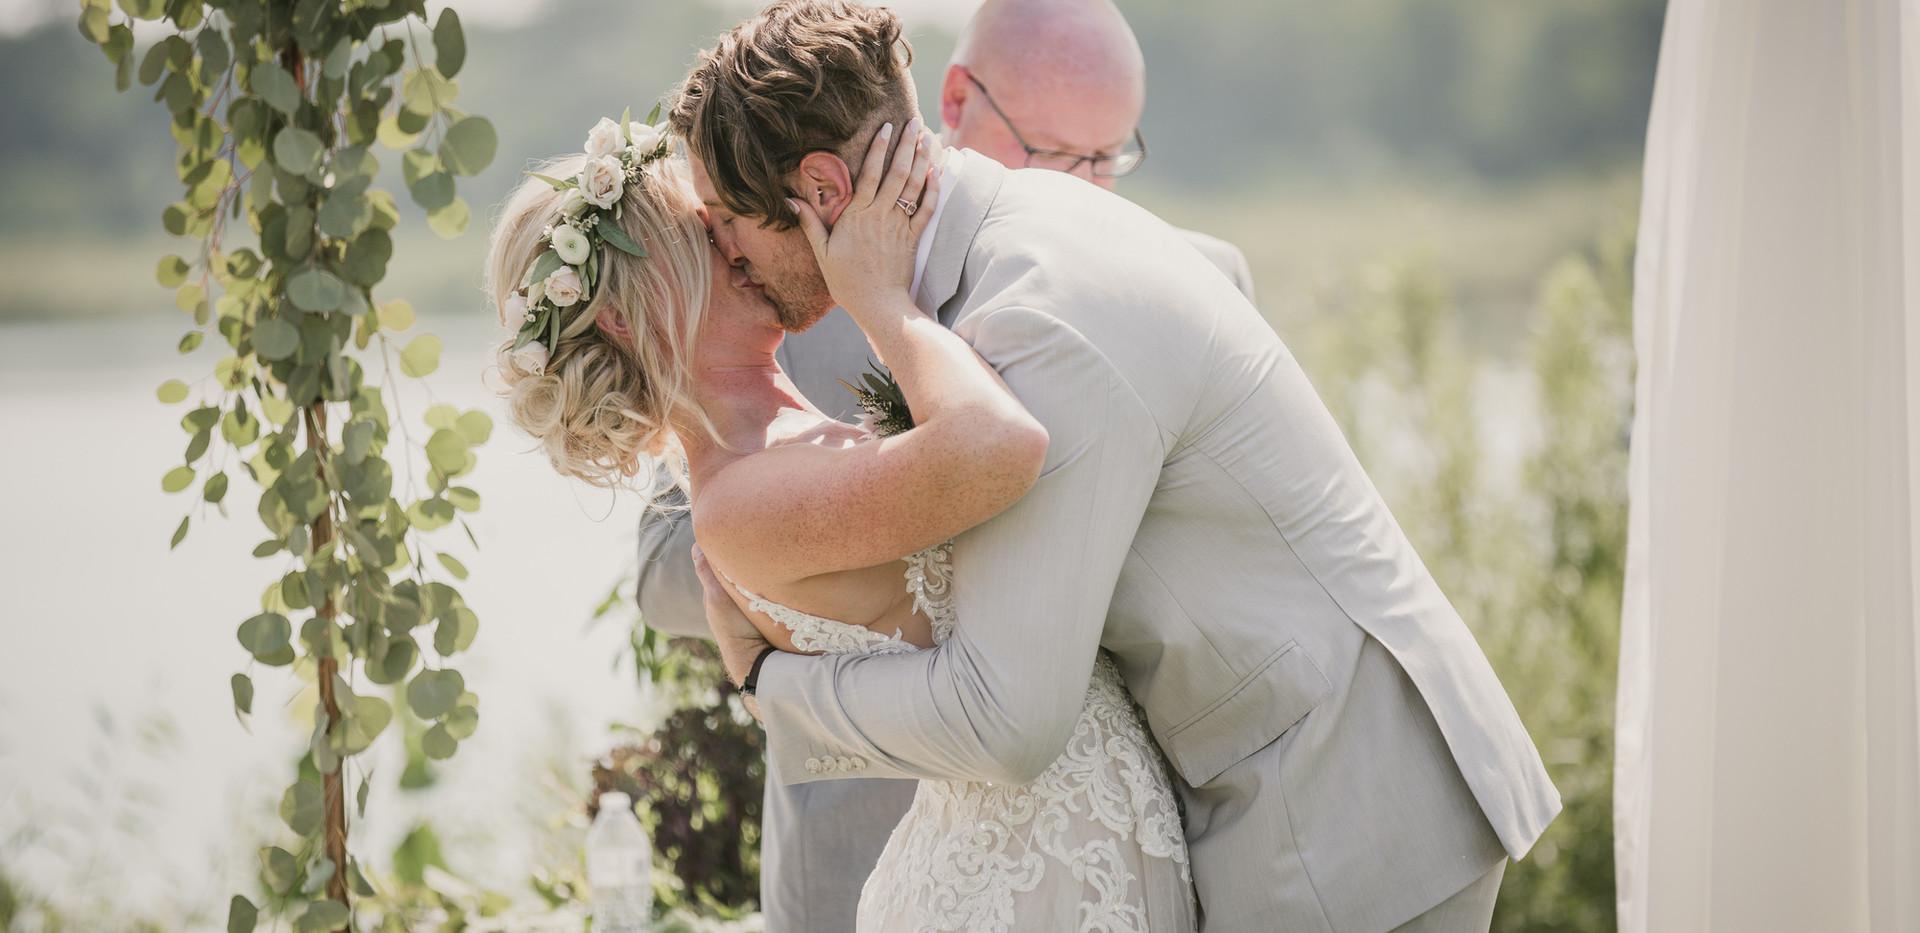 Intimate Wedding Photographers.jpg